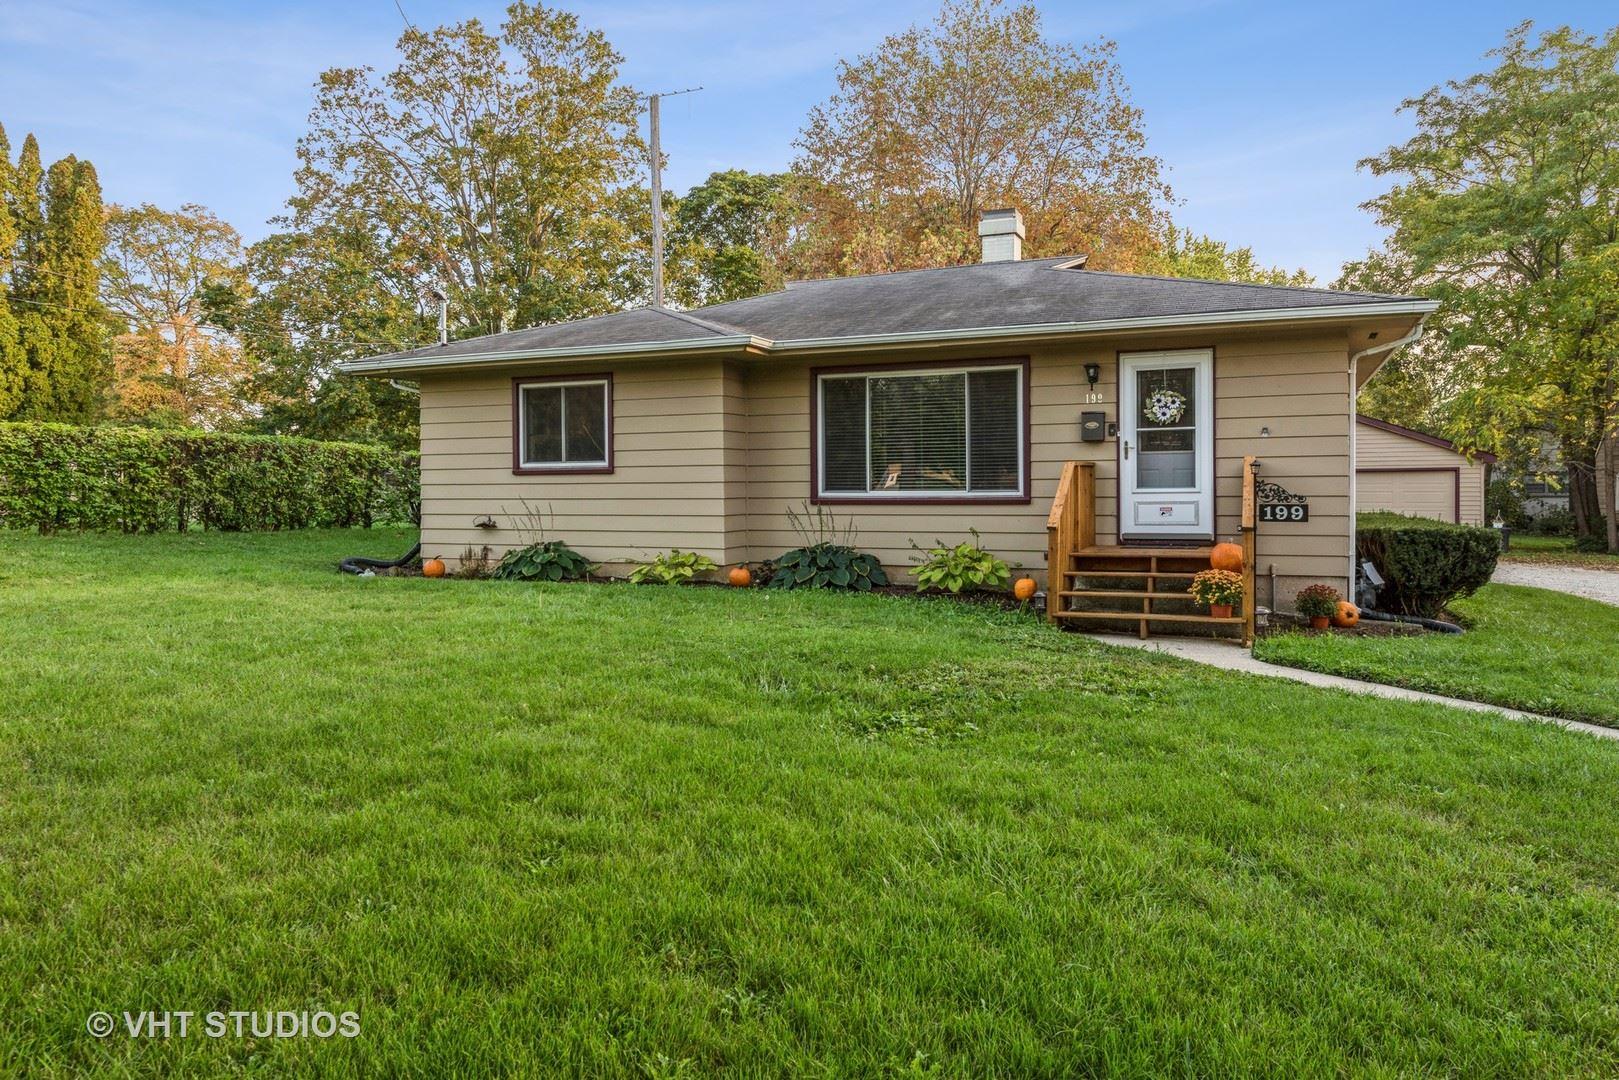 199 W WOODSTOCK Road, Crystal Lake, IL 60014 - #: 11243848